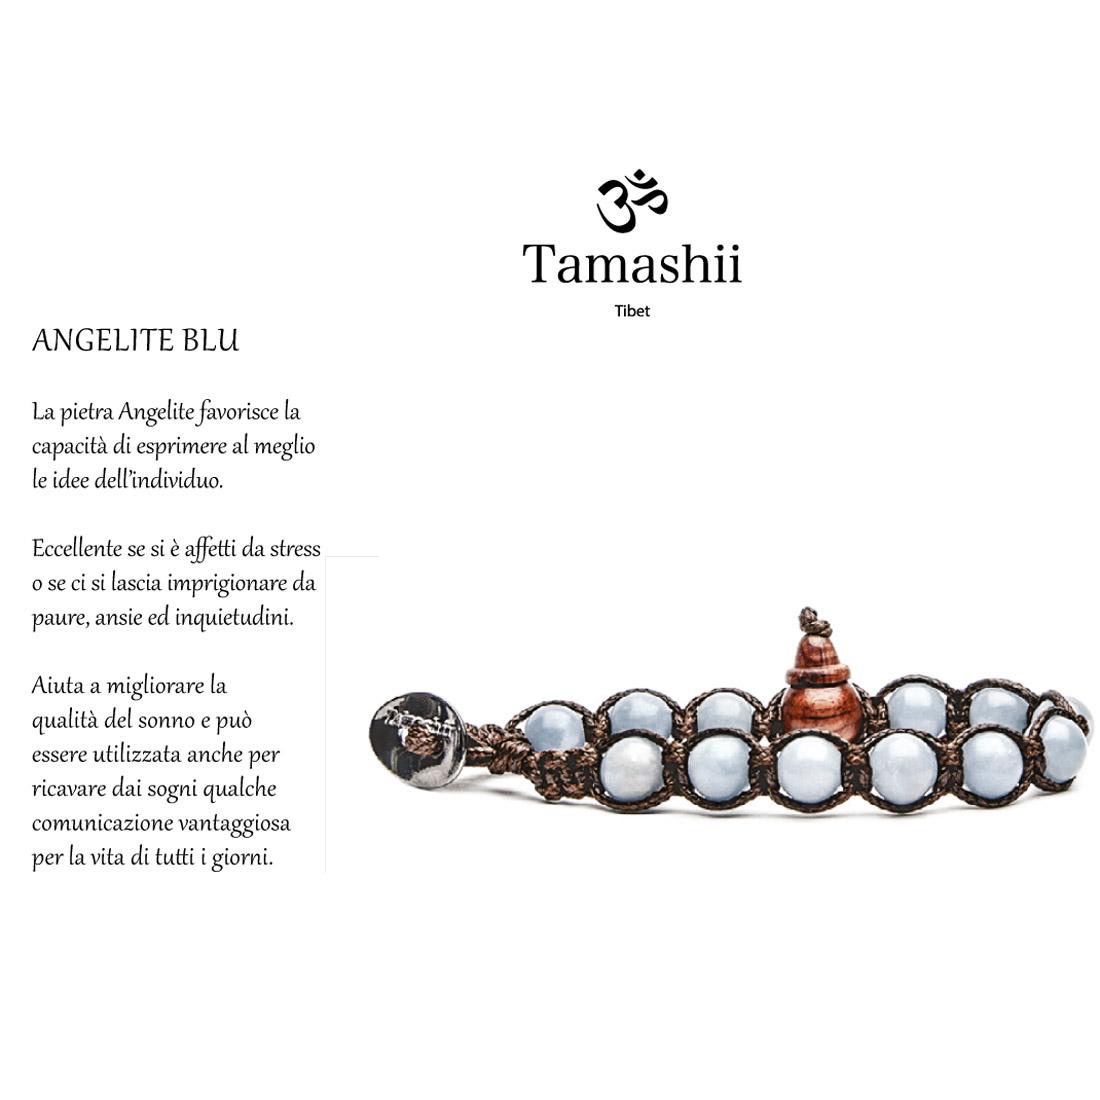 Bhs900 211 Tamashii Bracciale Blu Angelite Tibetano In n0w8kOP